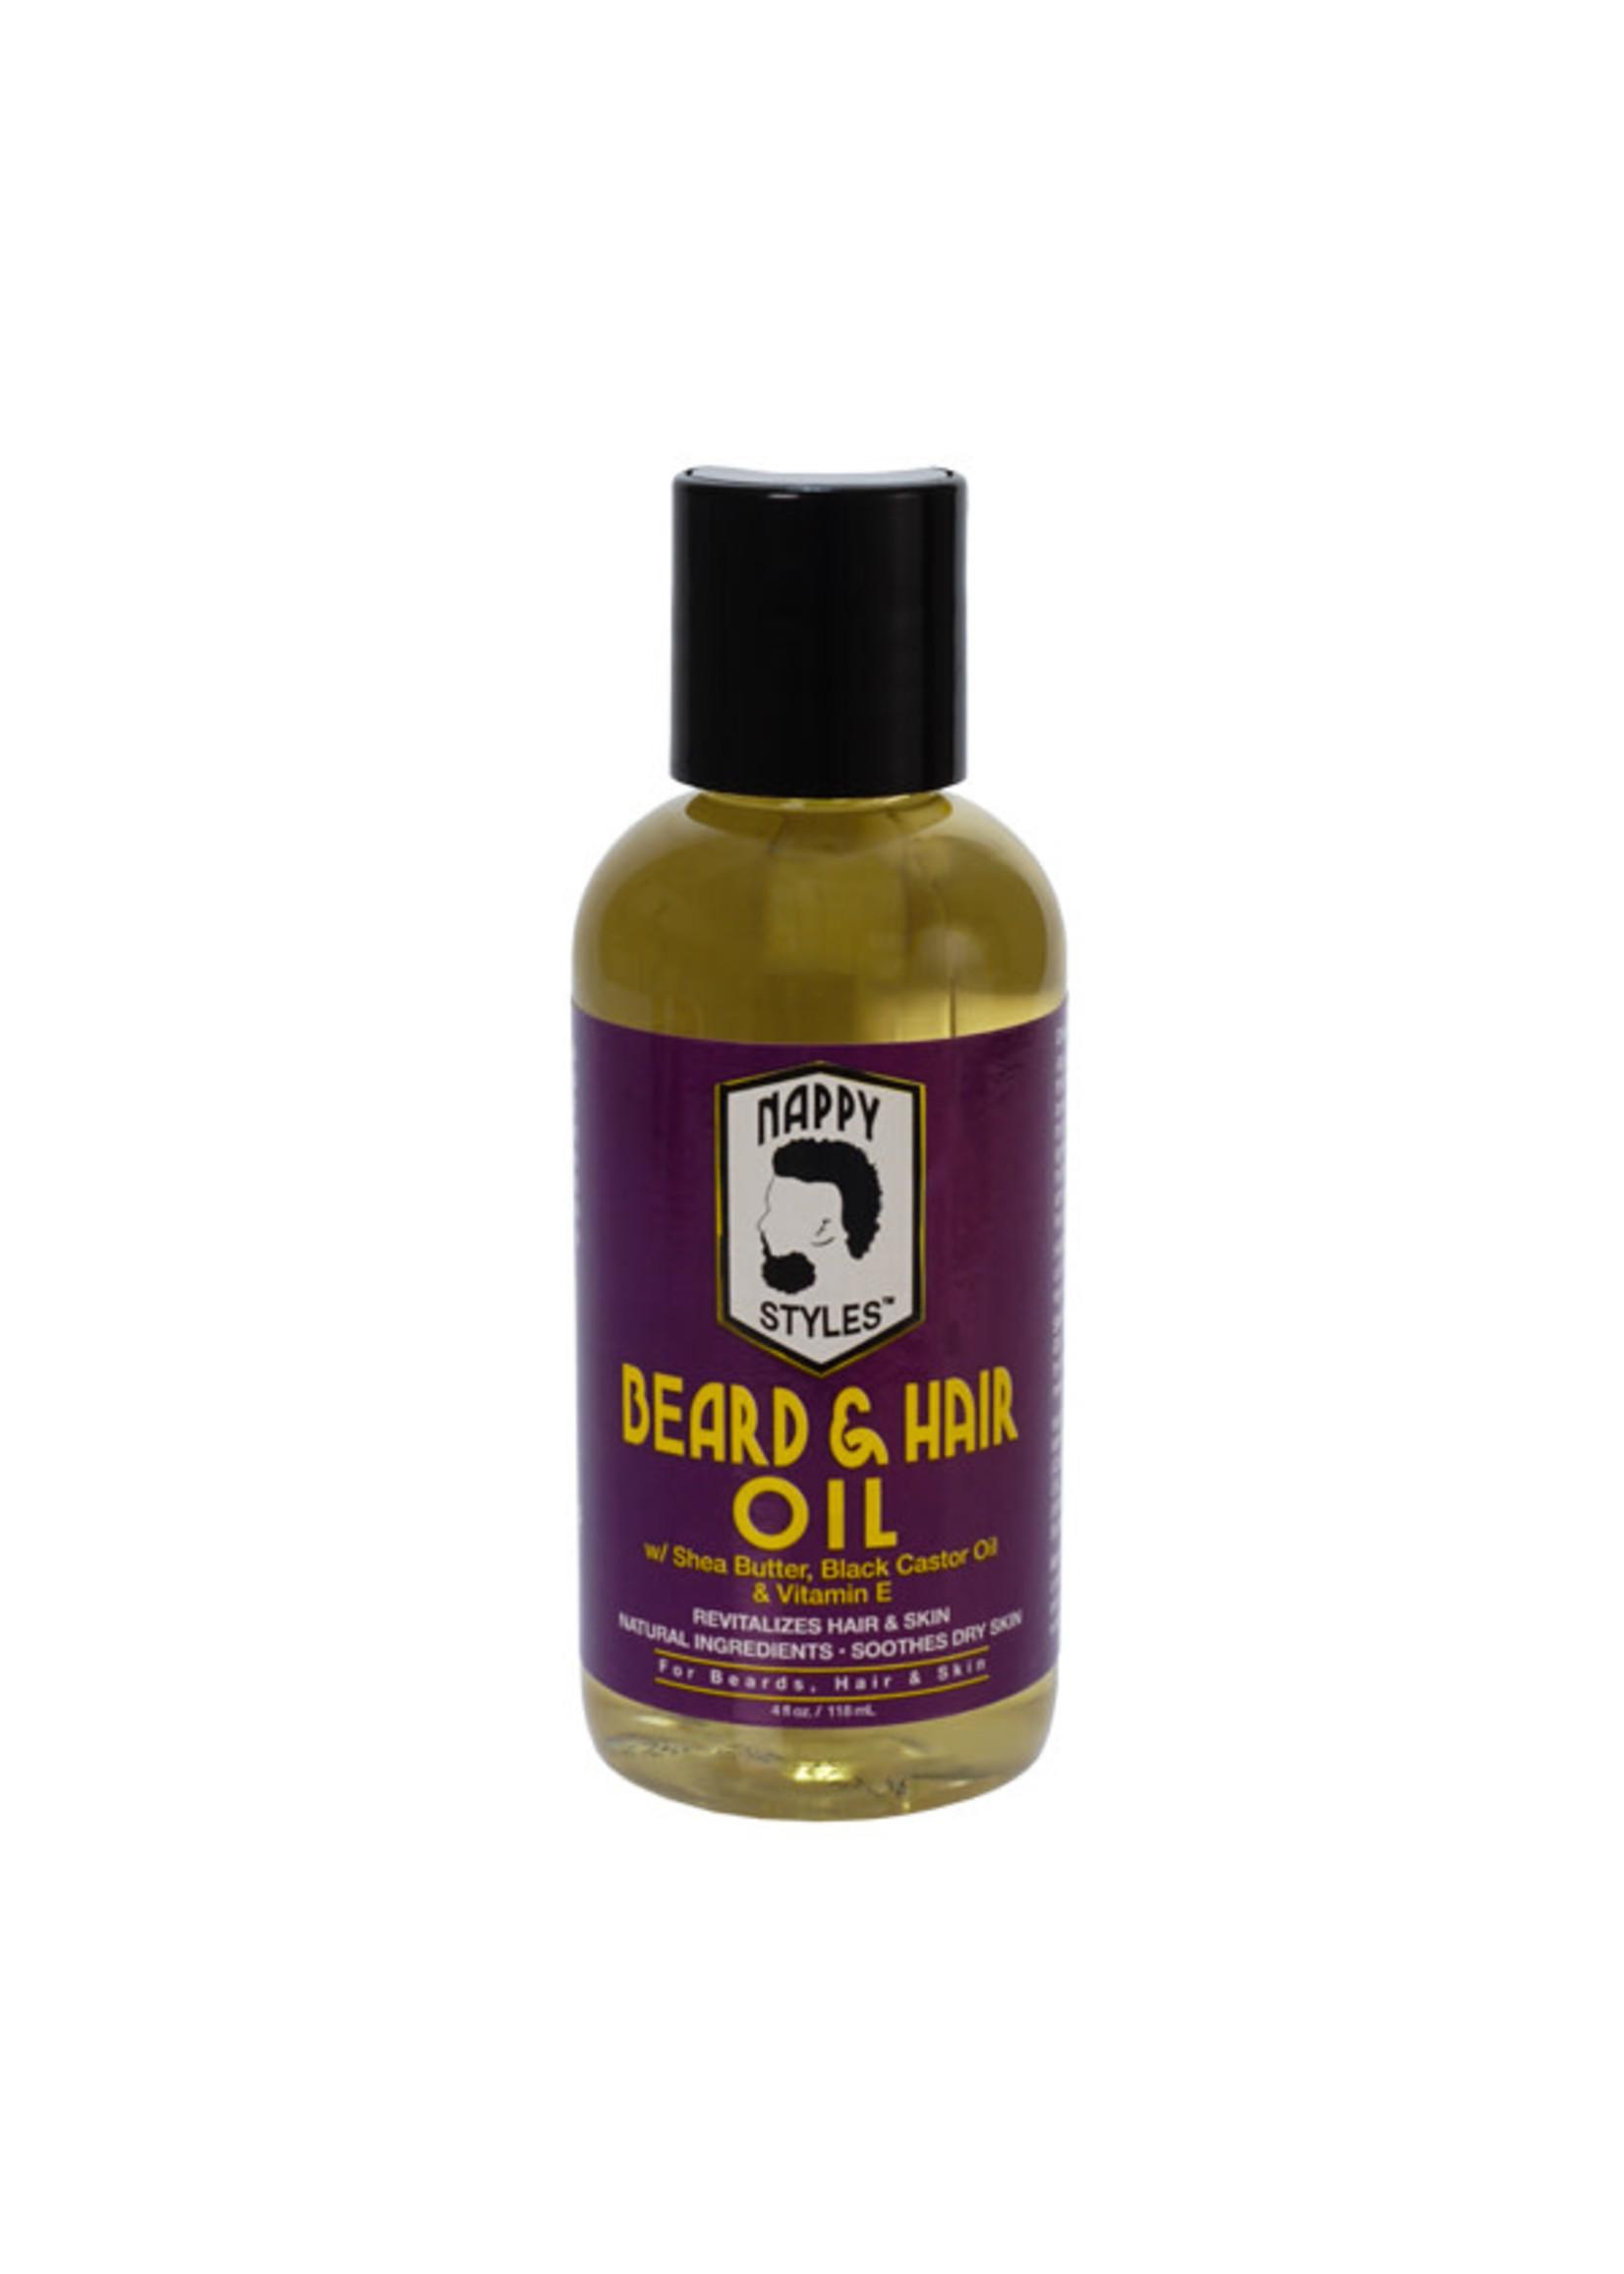 Nappy Styles Hair & Beard Oil